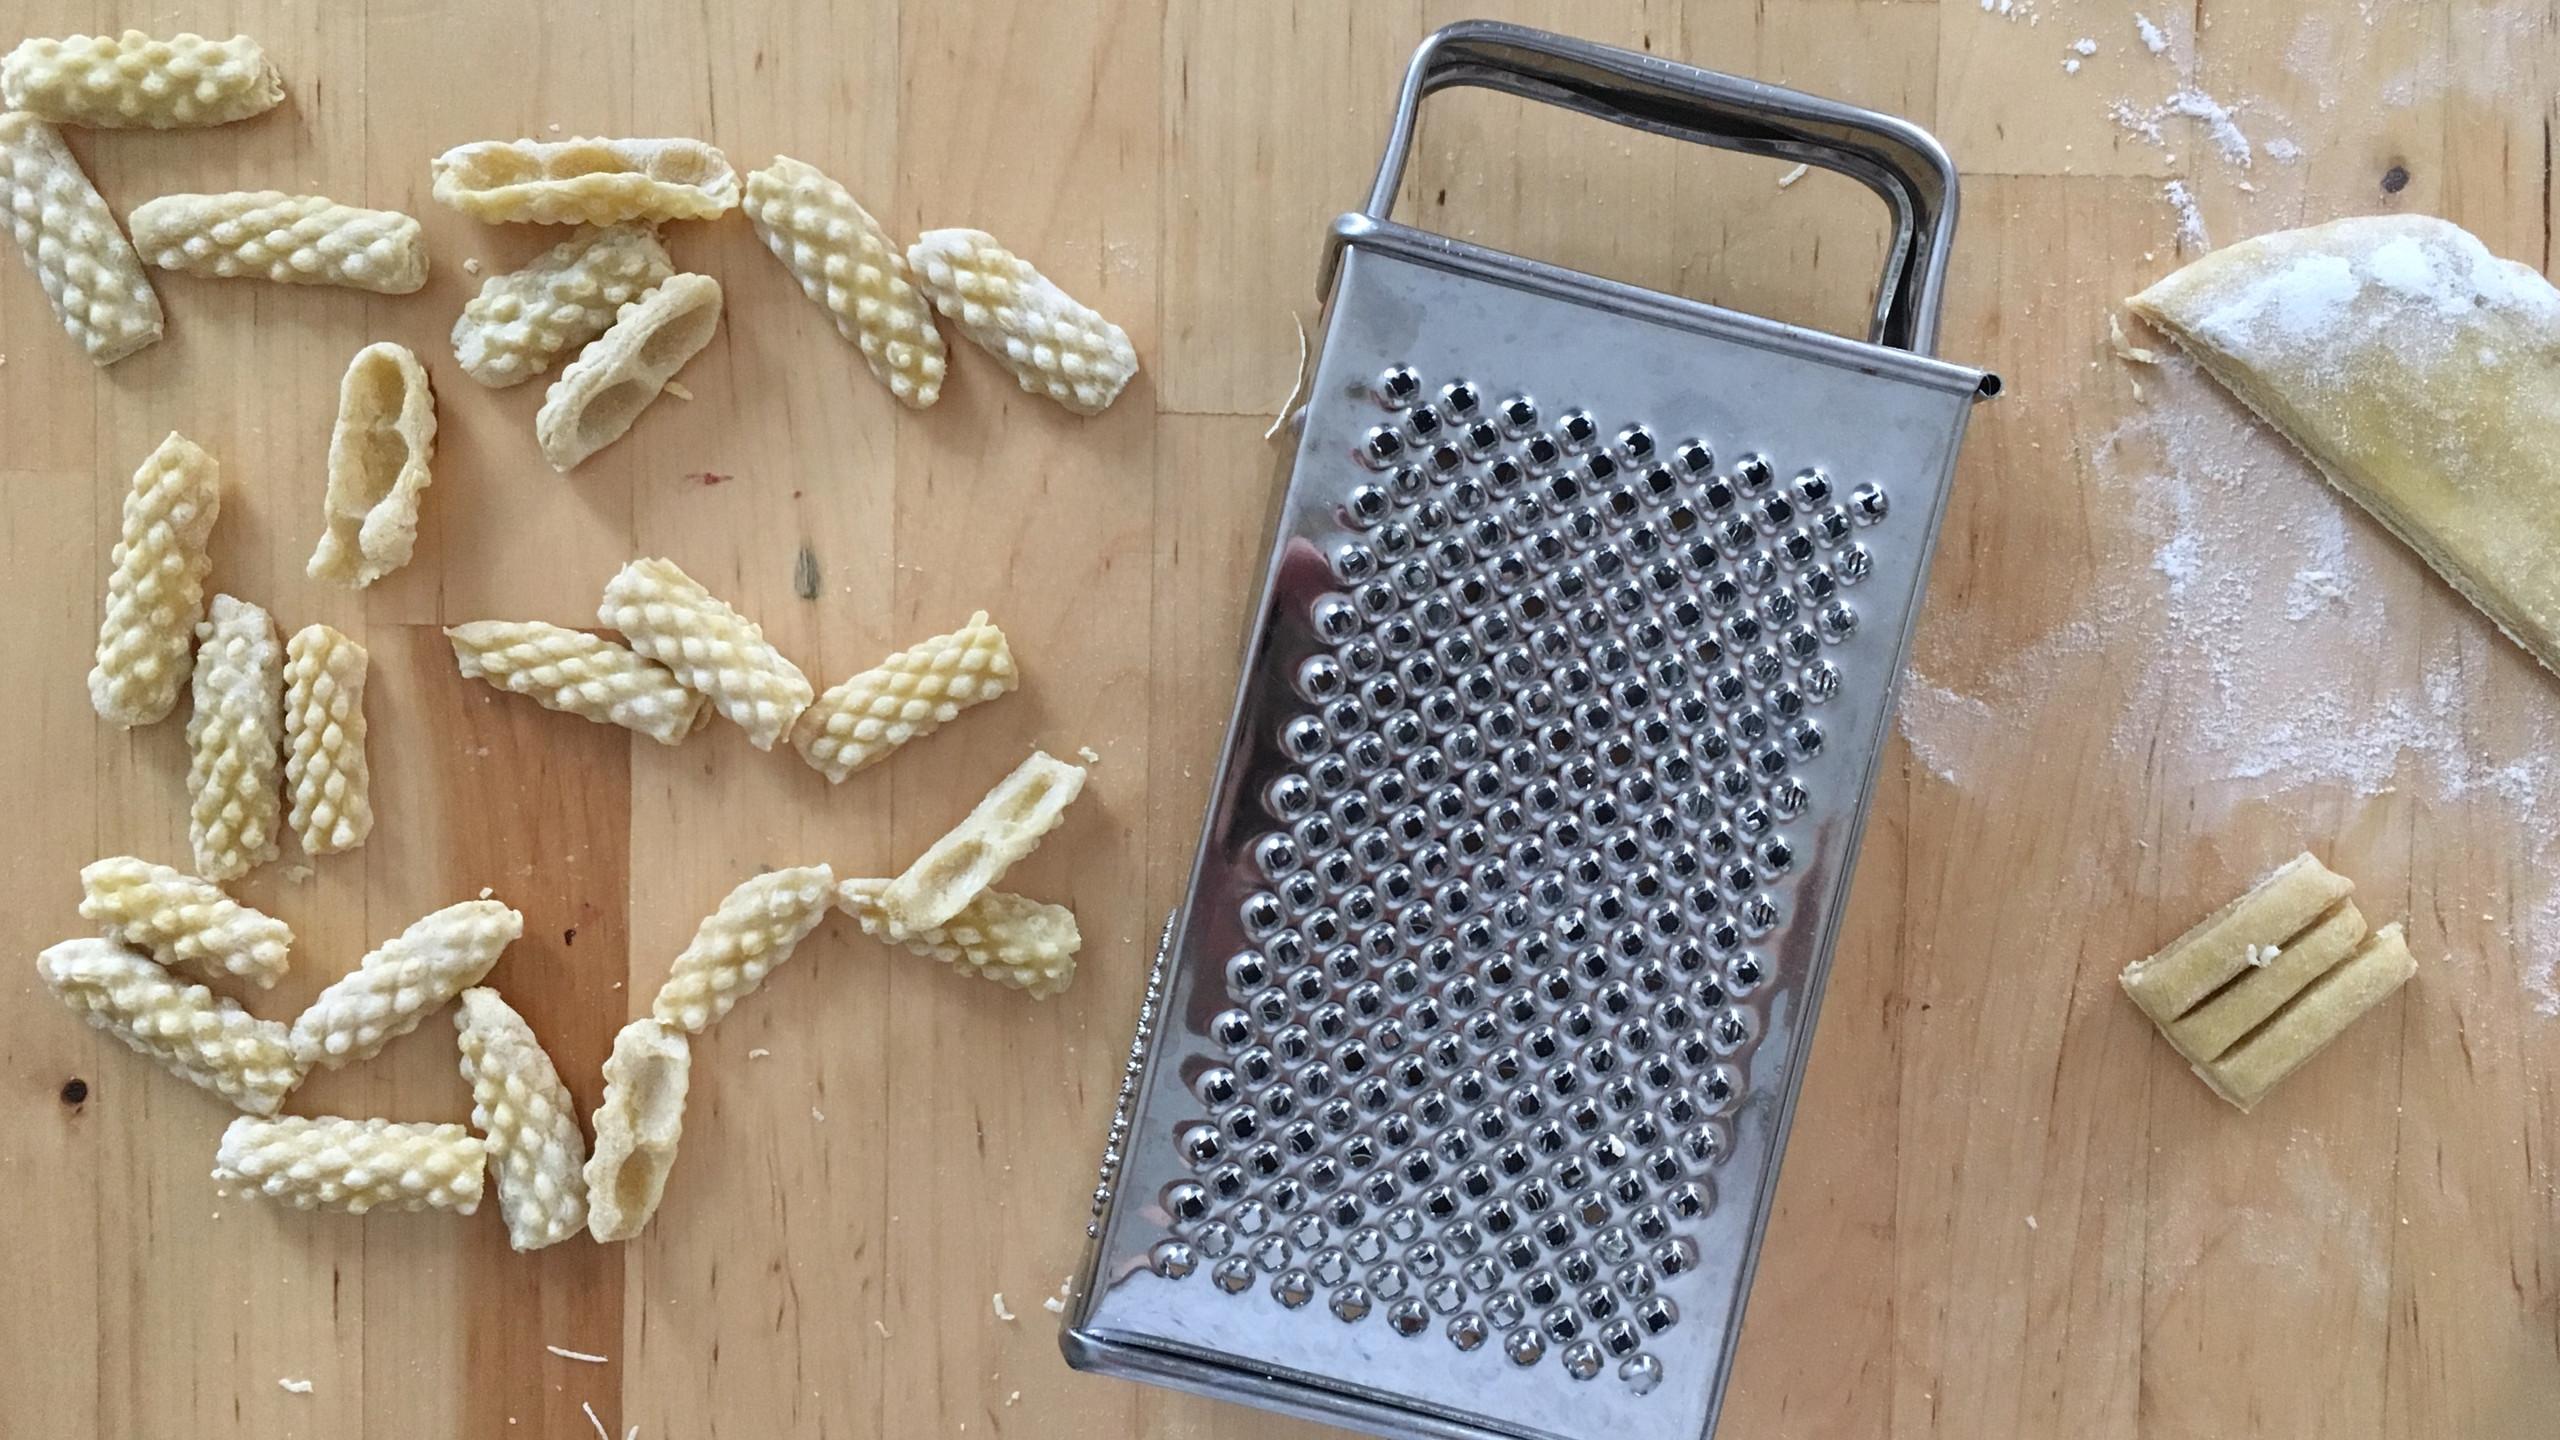 capunti, semolina pasta, handmade pasta, 100 days of pasta